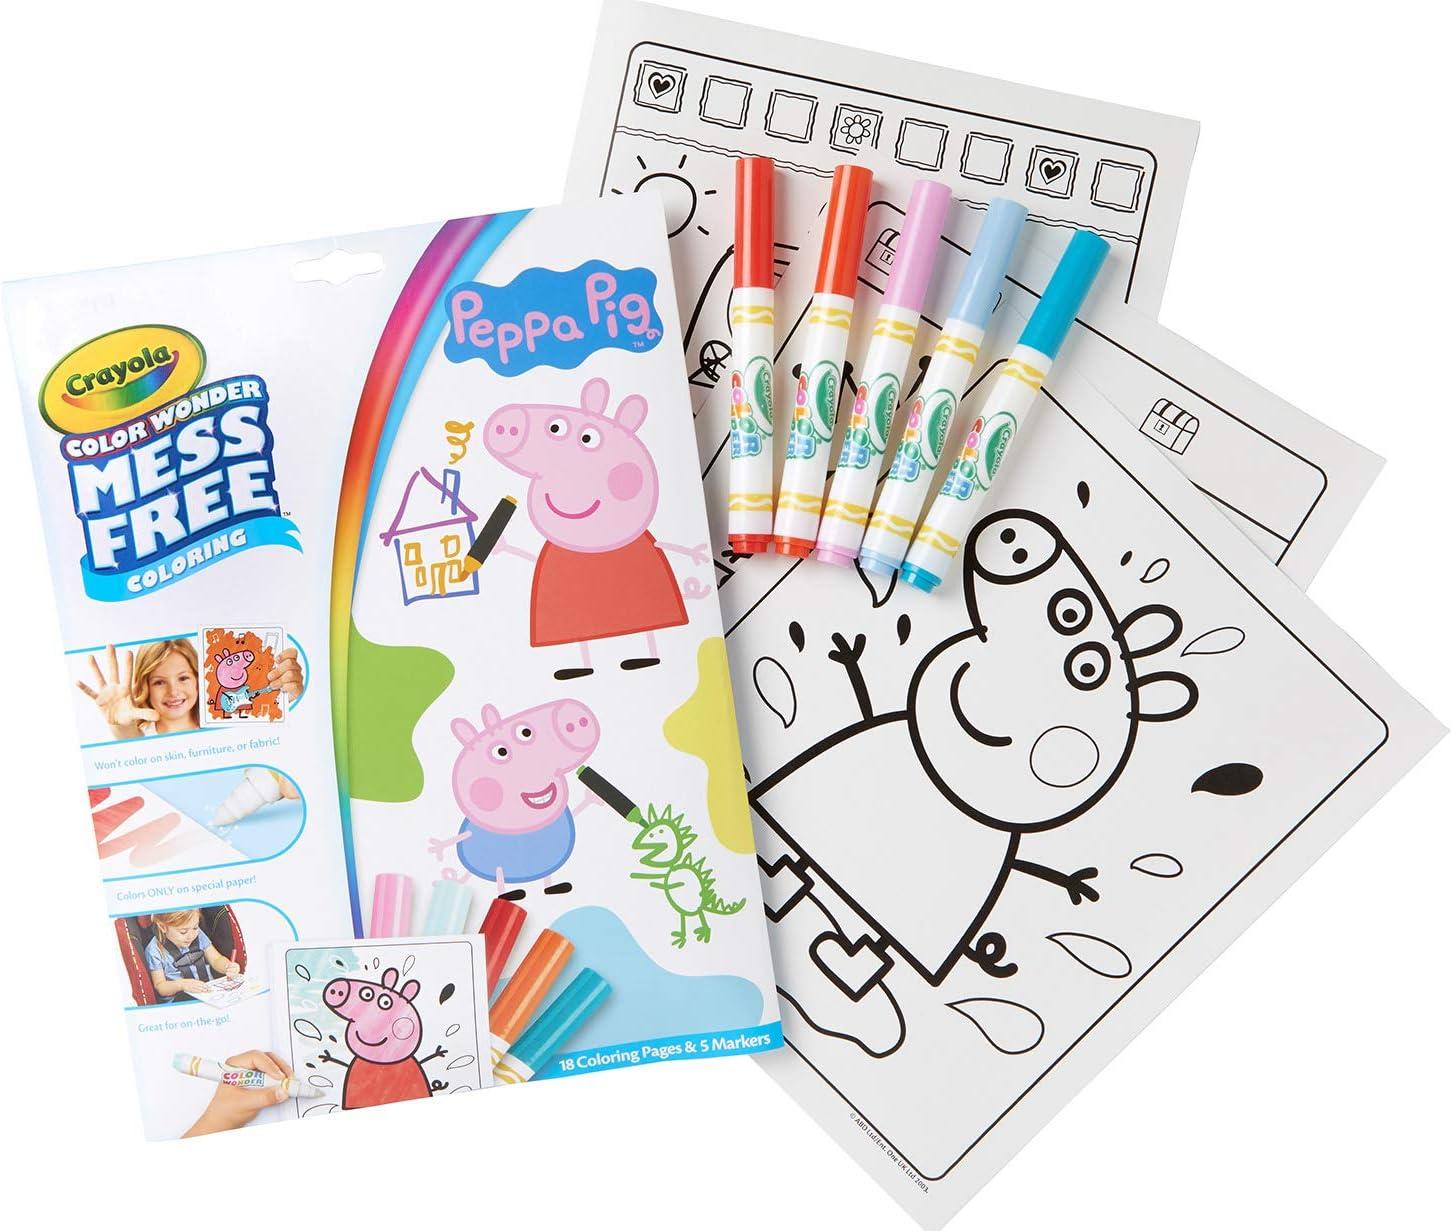 Amazon.com: Crayola Color Wonder Peppa Pig Coloring Pages, Mess ...